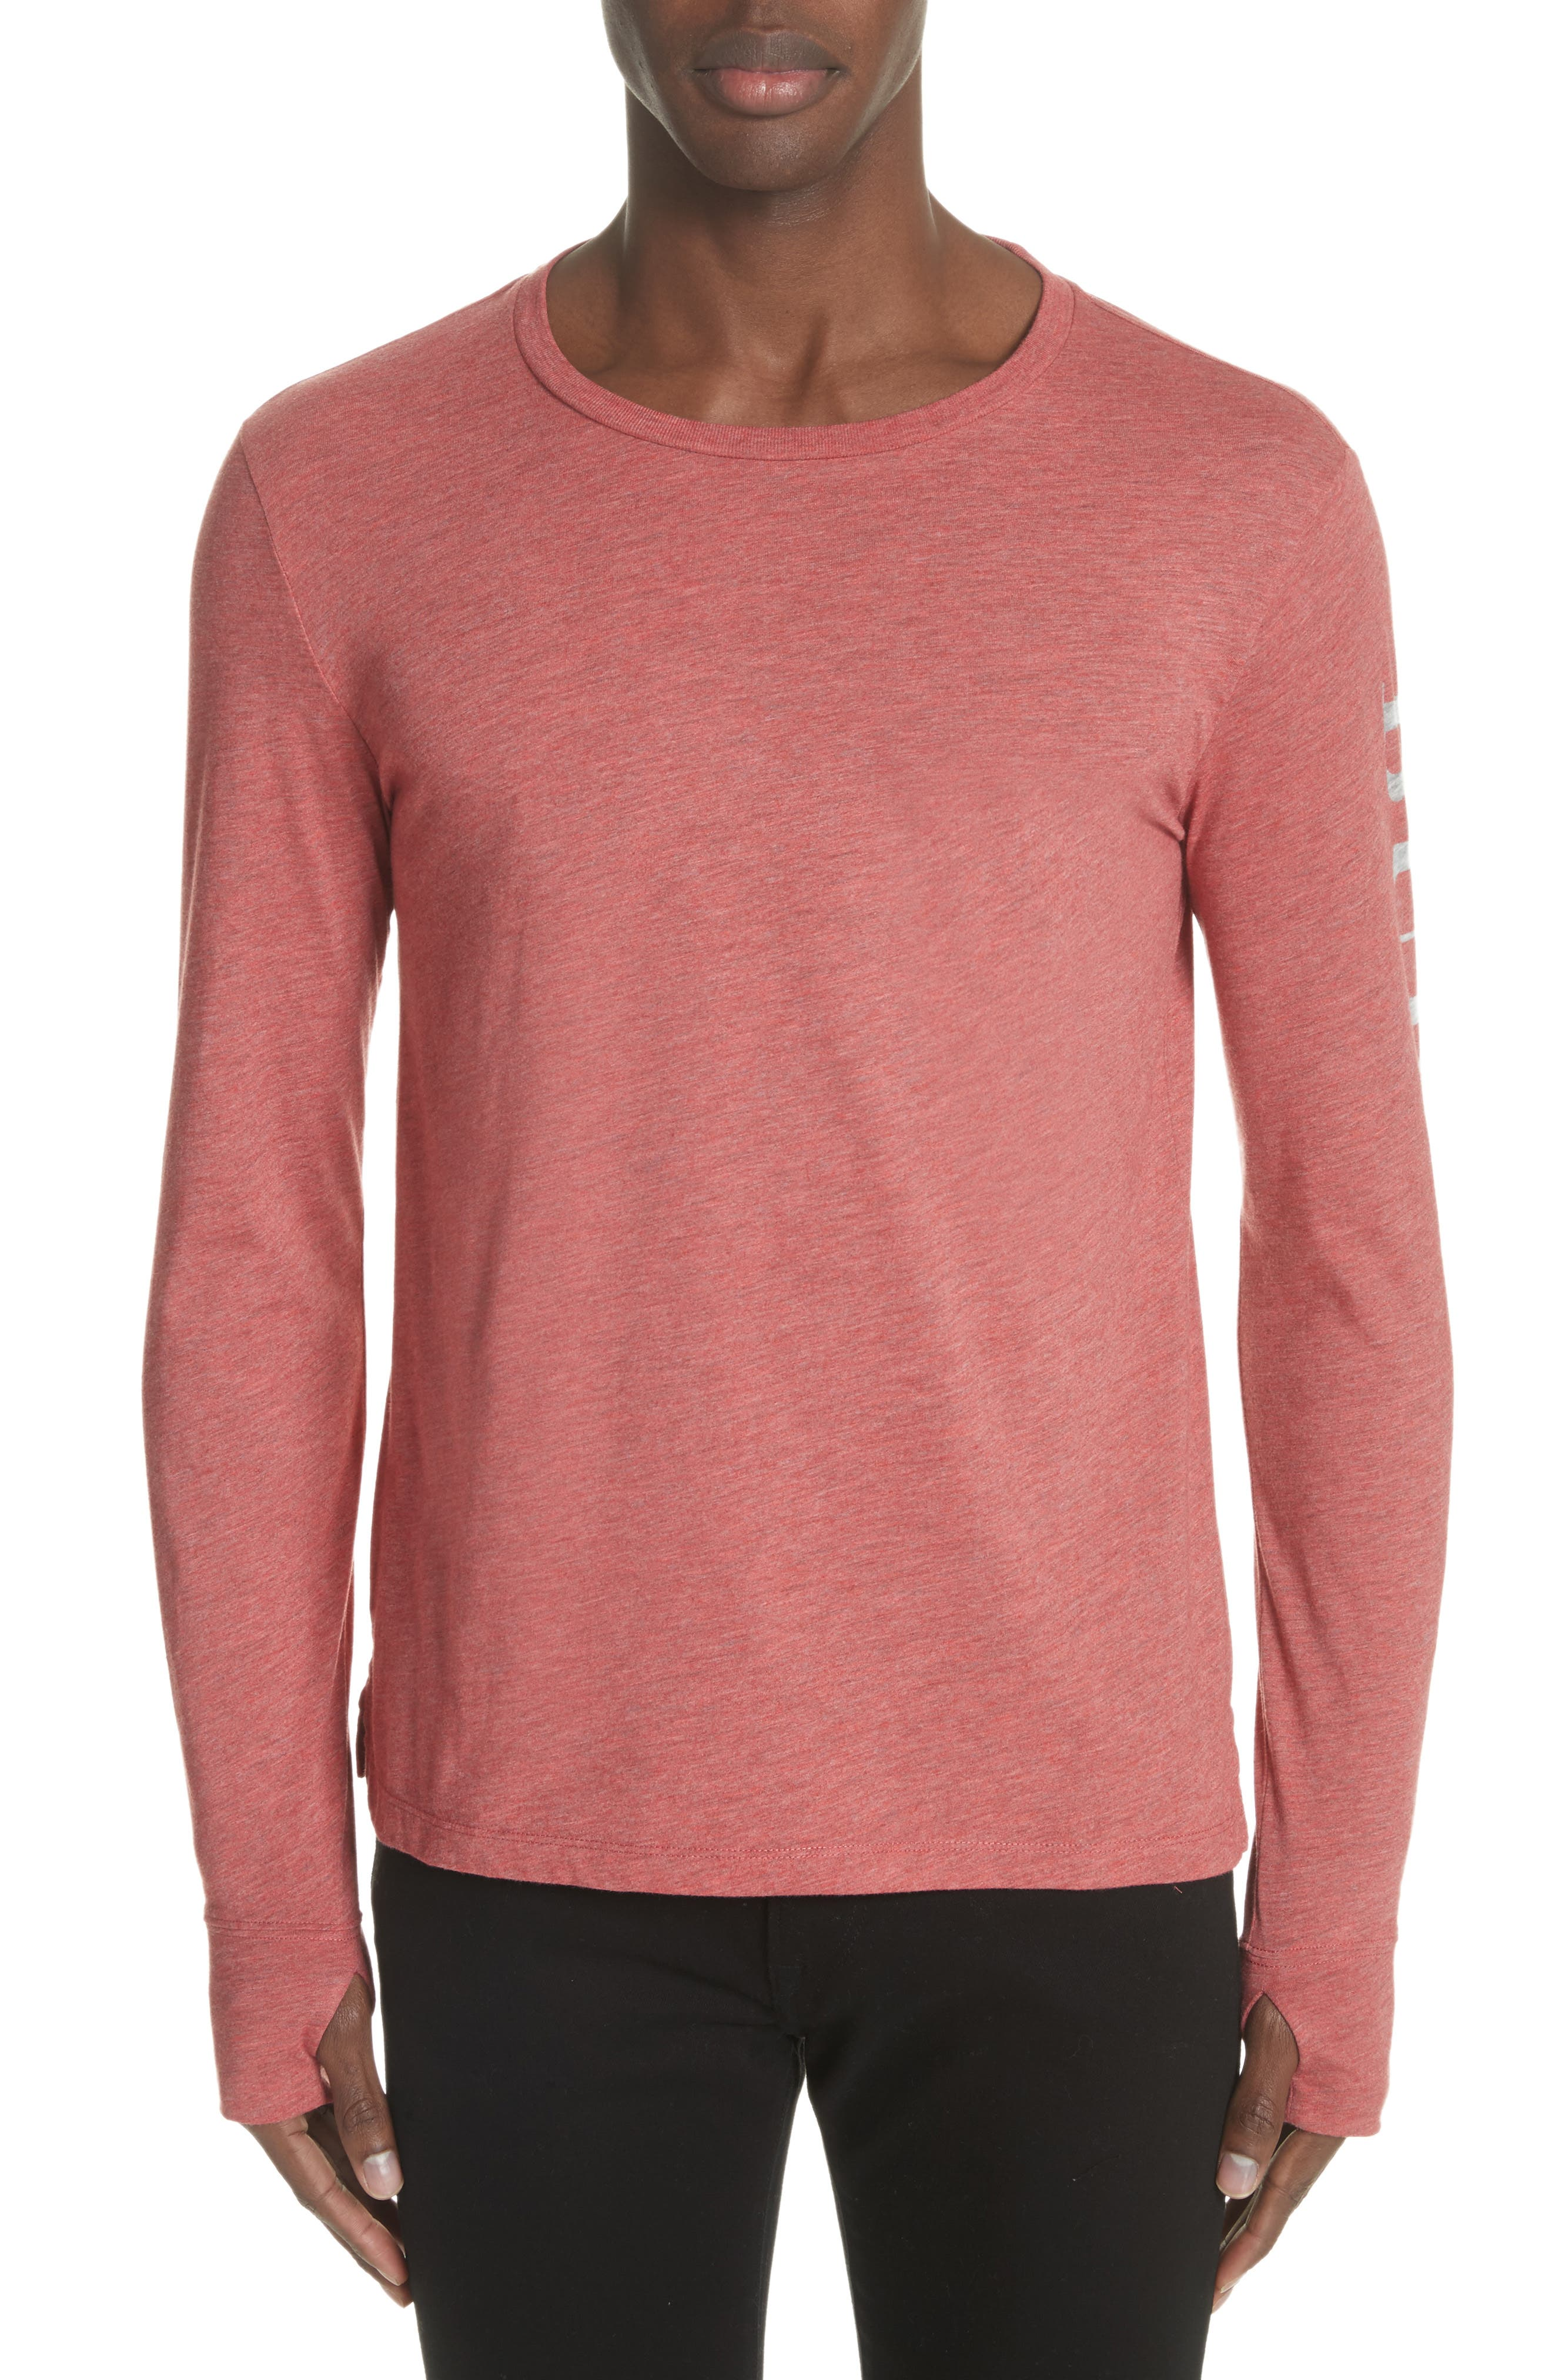 Burberry Marchston Regular Fit Crewneck Shirt